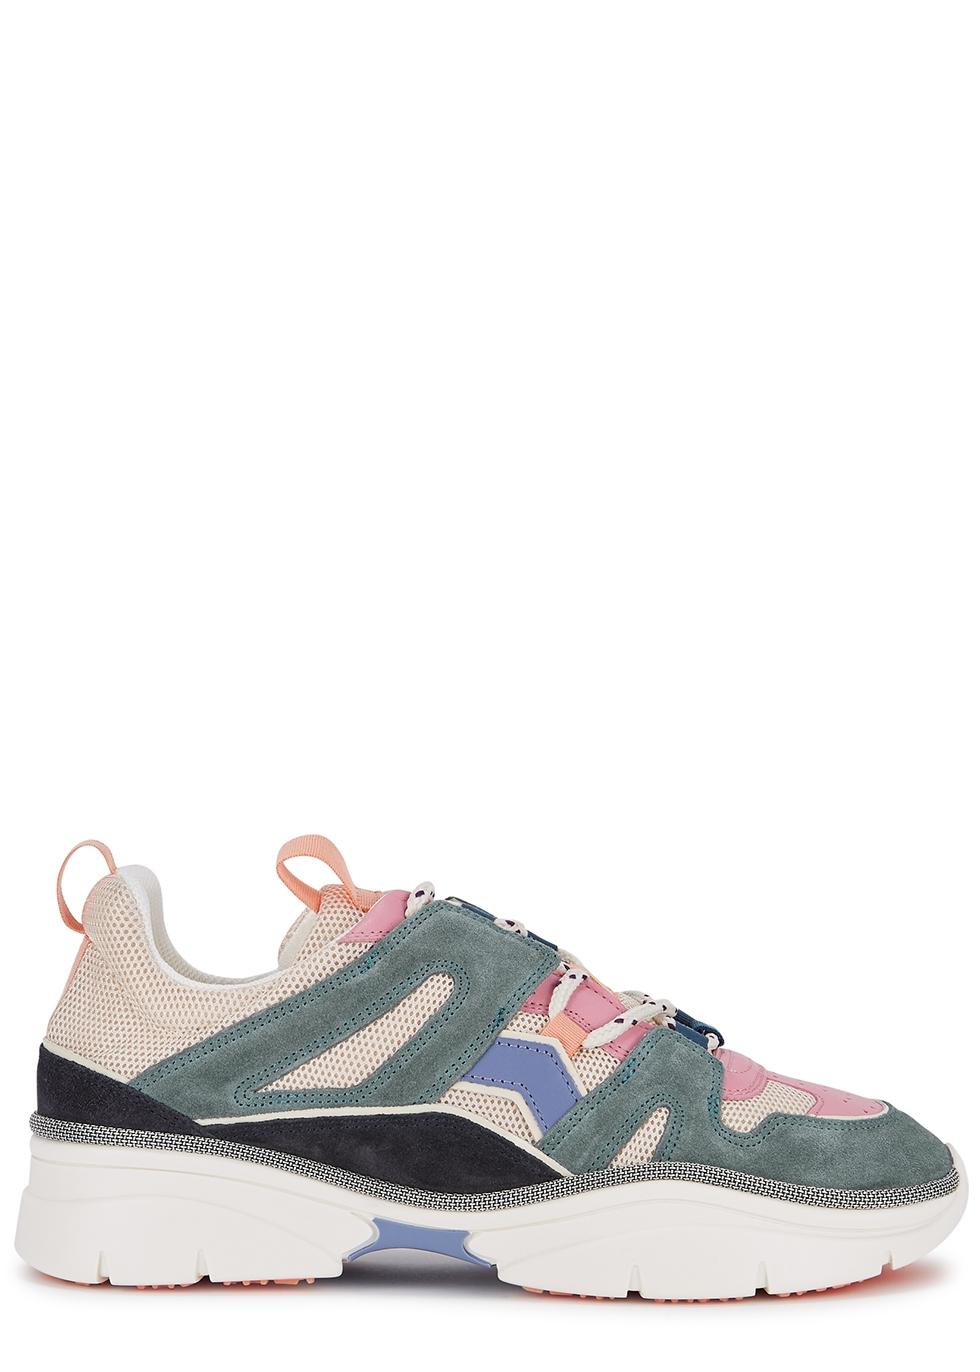 Kindsay panelled mesh sneakers